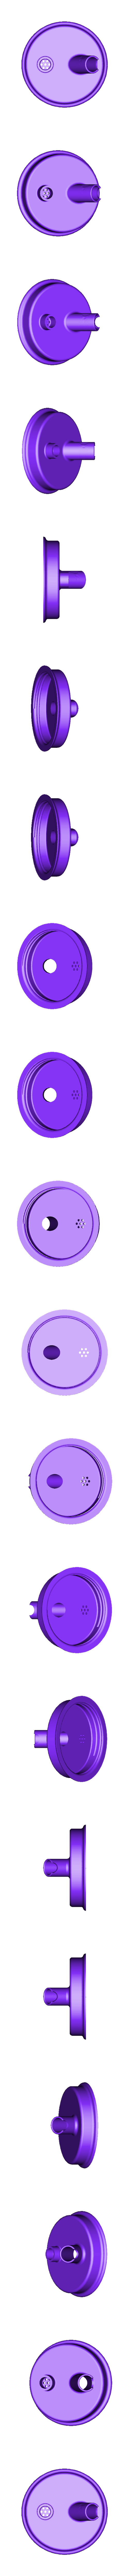 one_piece.stl Download free STL file Airbrush Cleaner Set For Yeast Jar • 3D printable design, rebeltaz